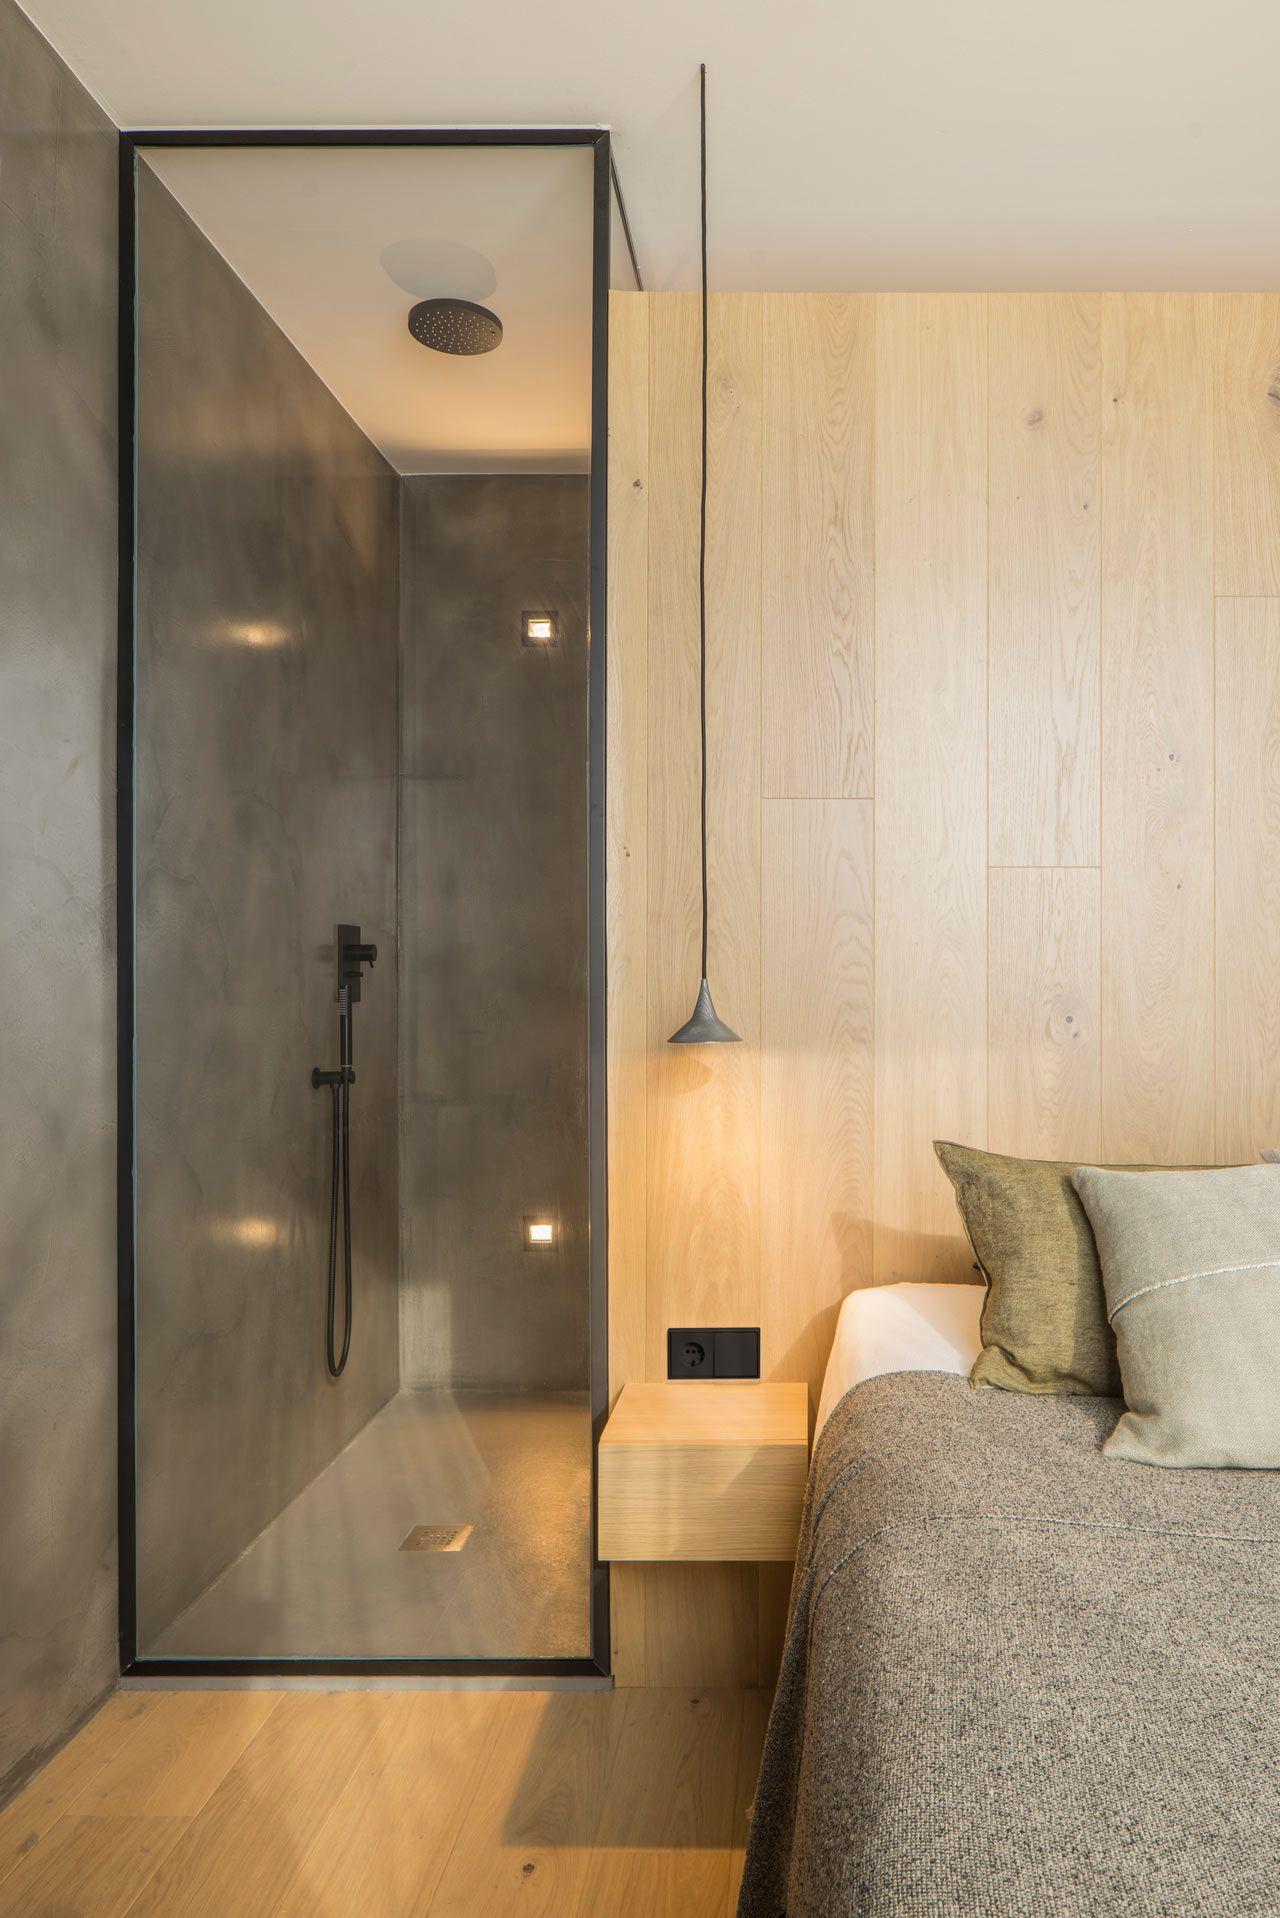 bathroom, wooden floor, grey wall, wooden wall, wooden floating sidde table, glass door, grey pendant